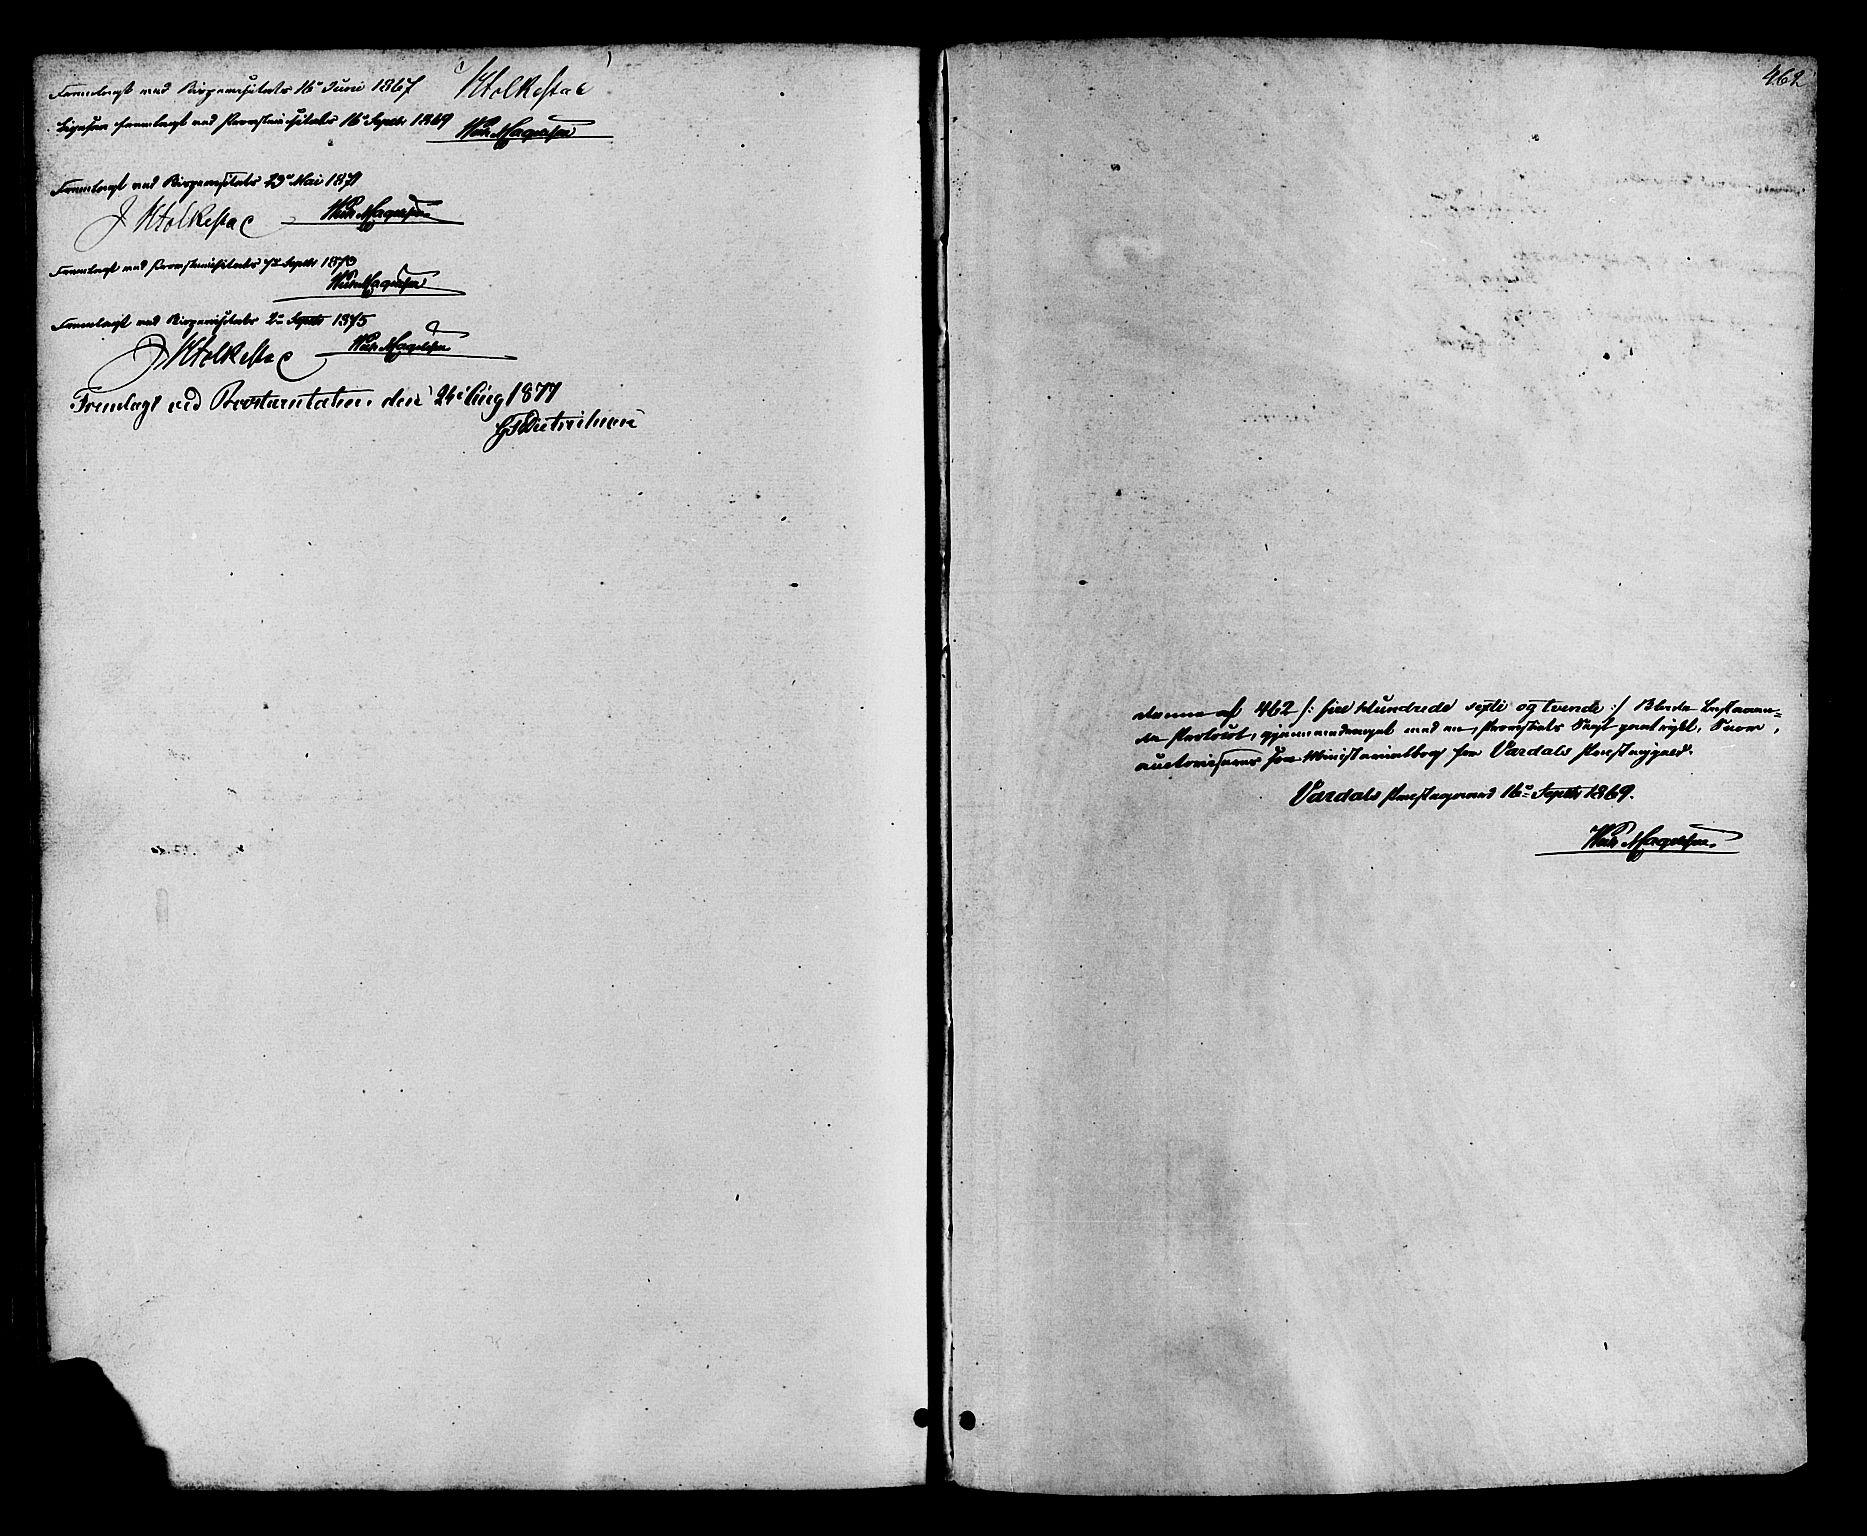 SAH, Vardal prestekontor, H/Ha/Haa/L0007: Ministerialbok nr. 7, 1867-1878, s. 462